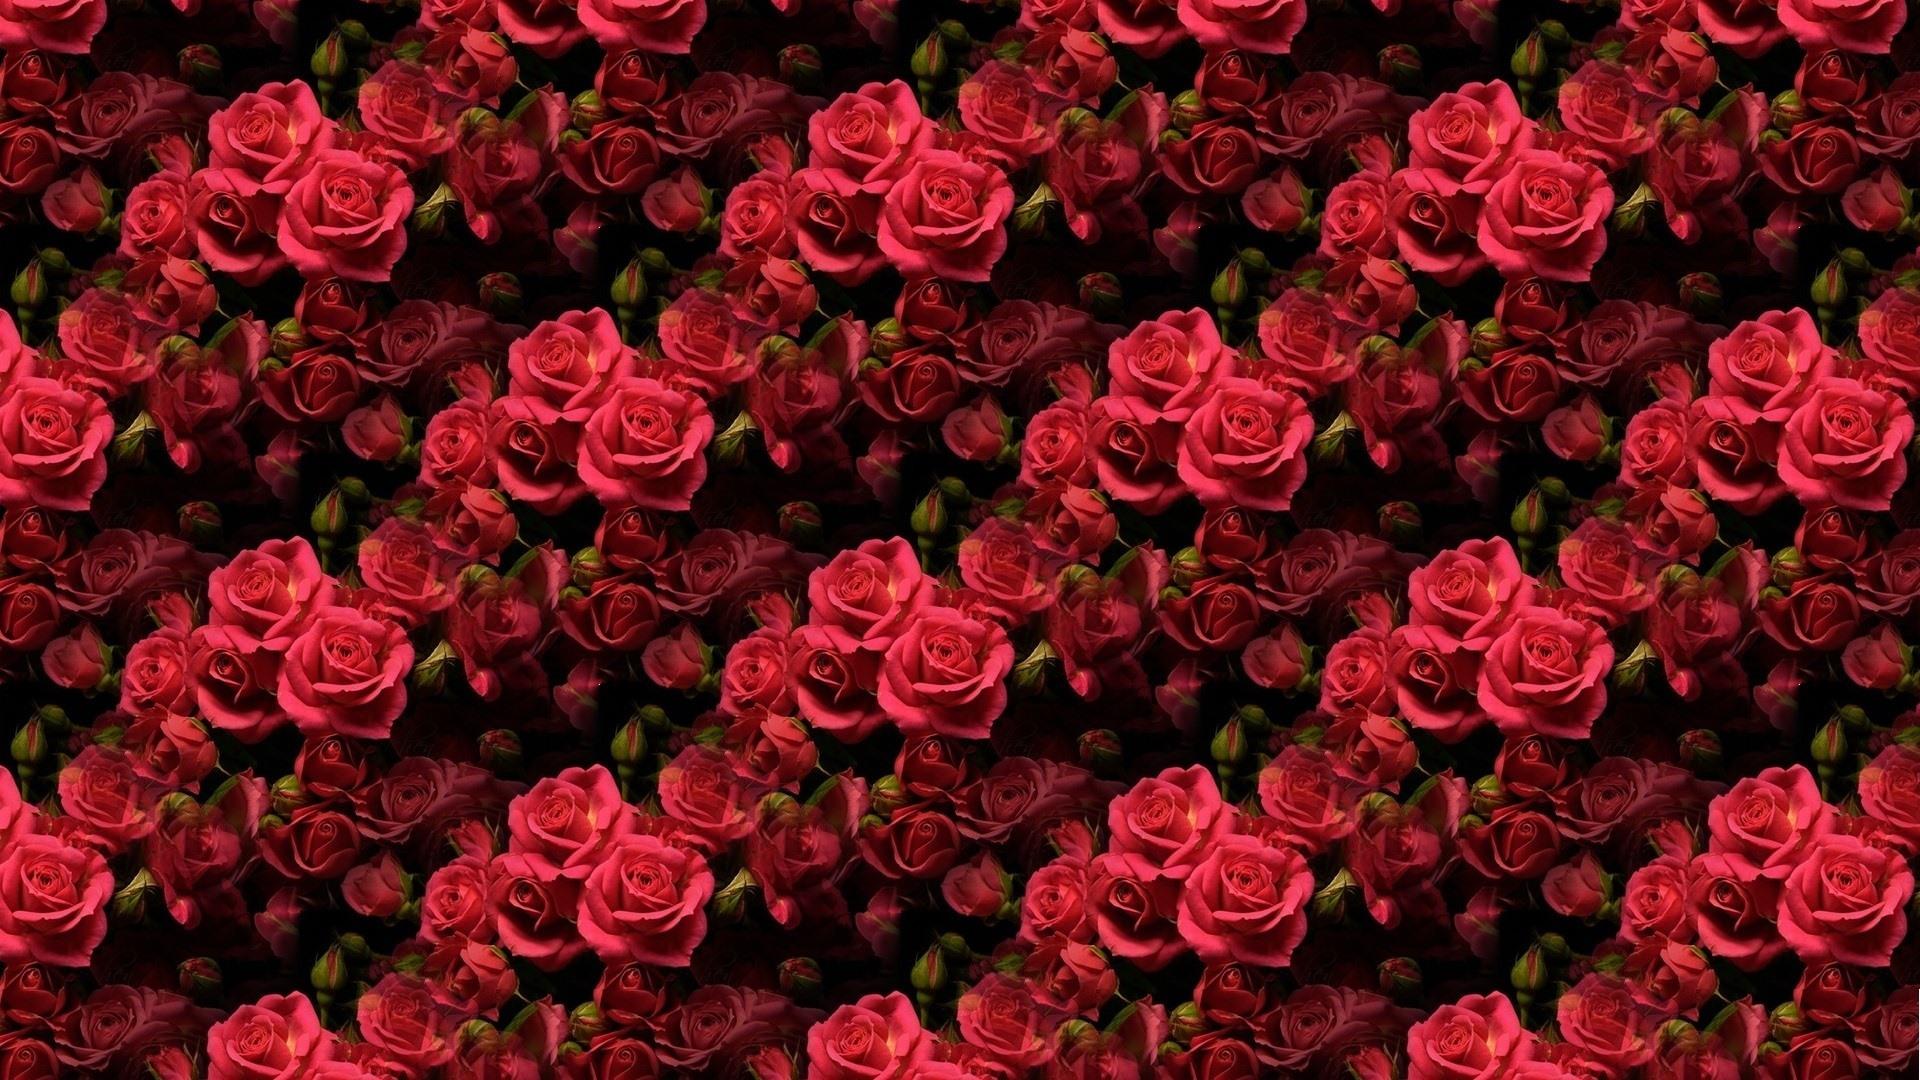 Wallpapers Rosas Rojas: Fondos De Pantalla Muchas Rosas Rojas, Fondo De Textura